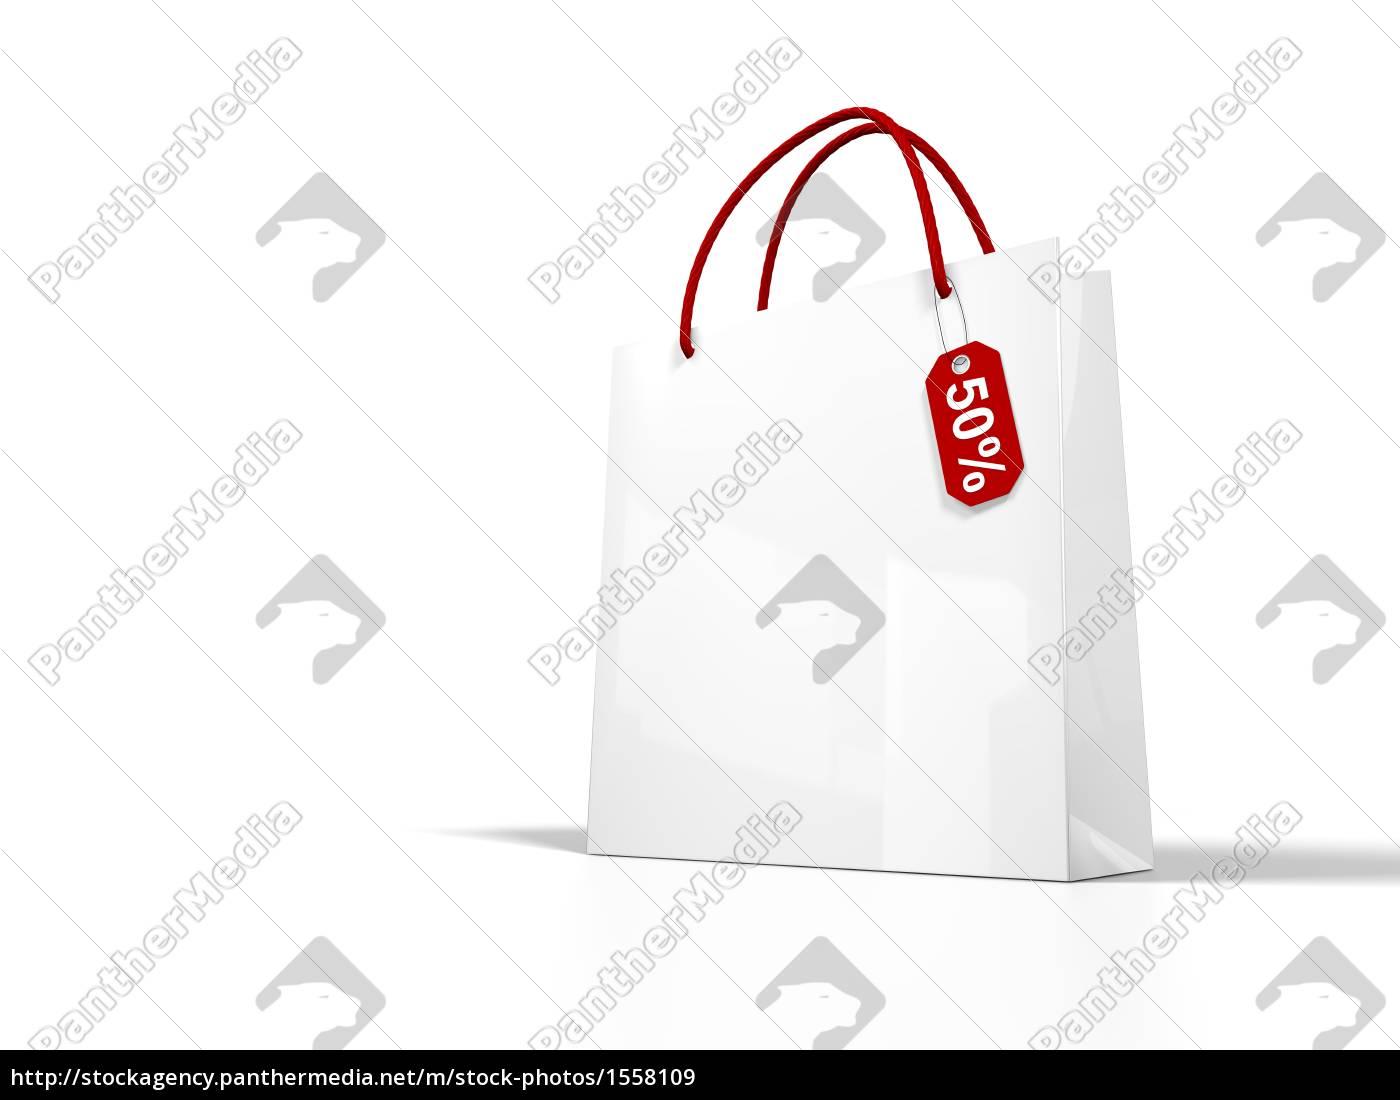 bag, paper, bag - 1558109